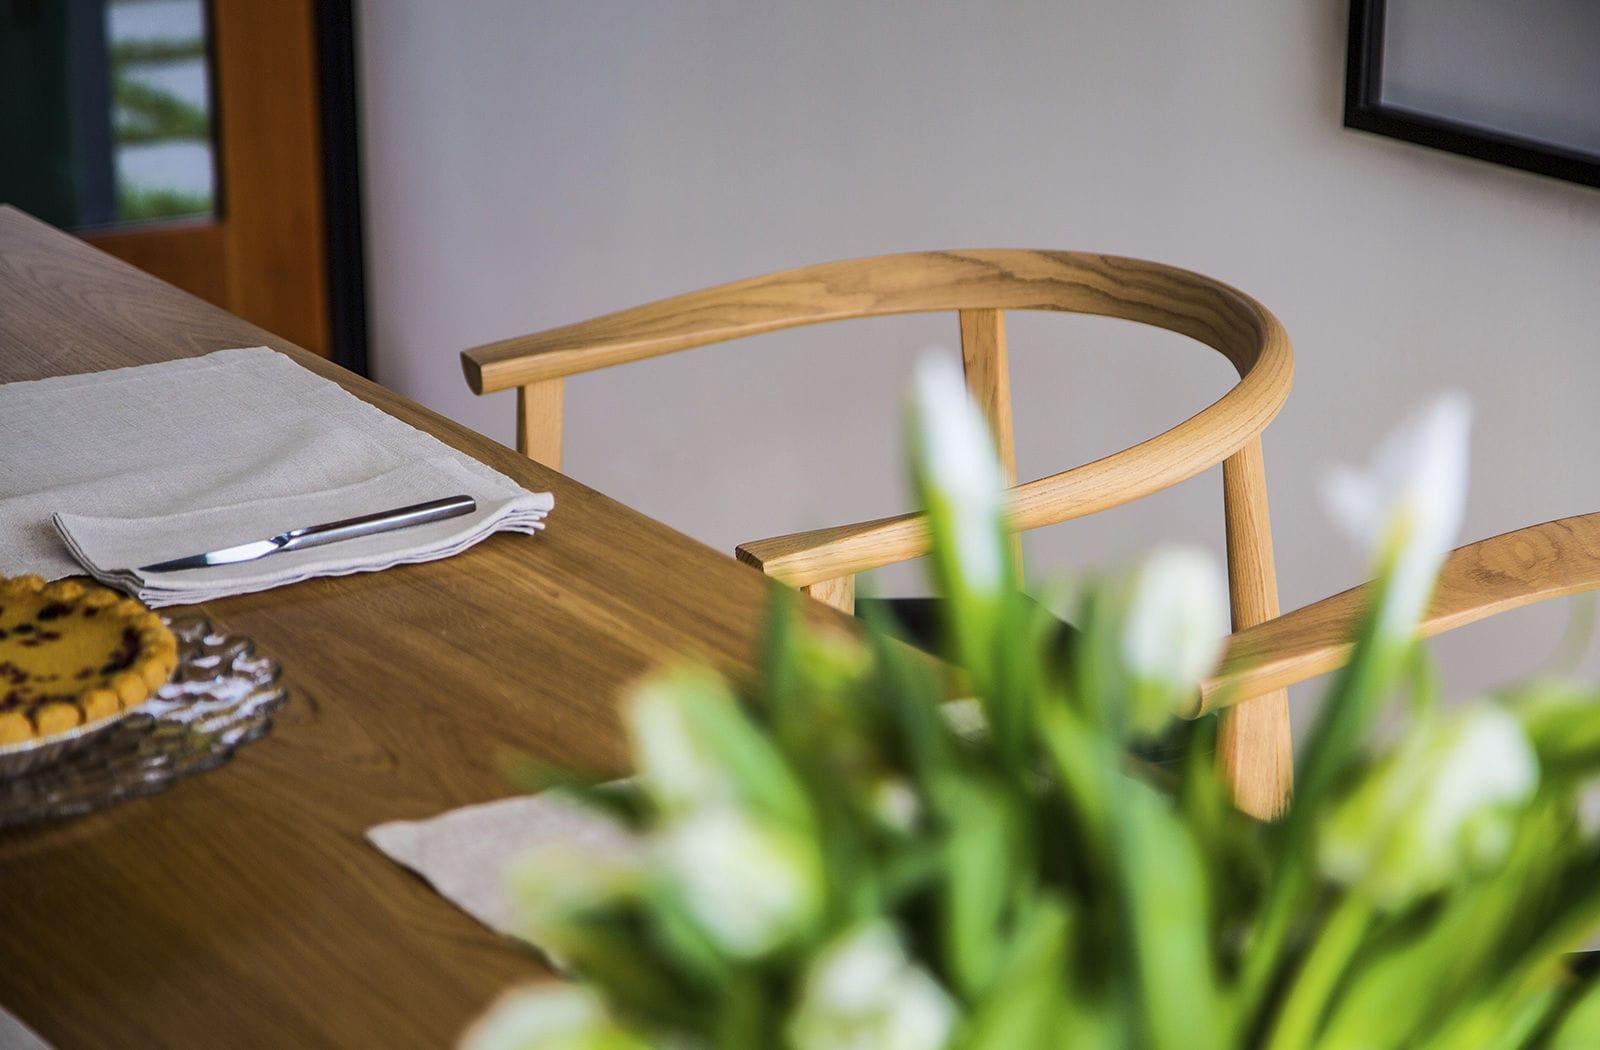 Sedia Imbottita Con Braccioli : Sedia moderna imbottita con braccioli in legno massiccio